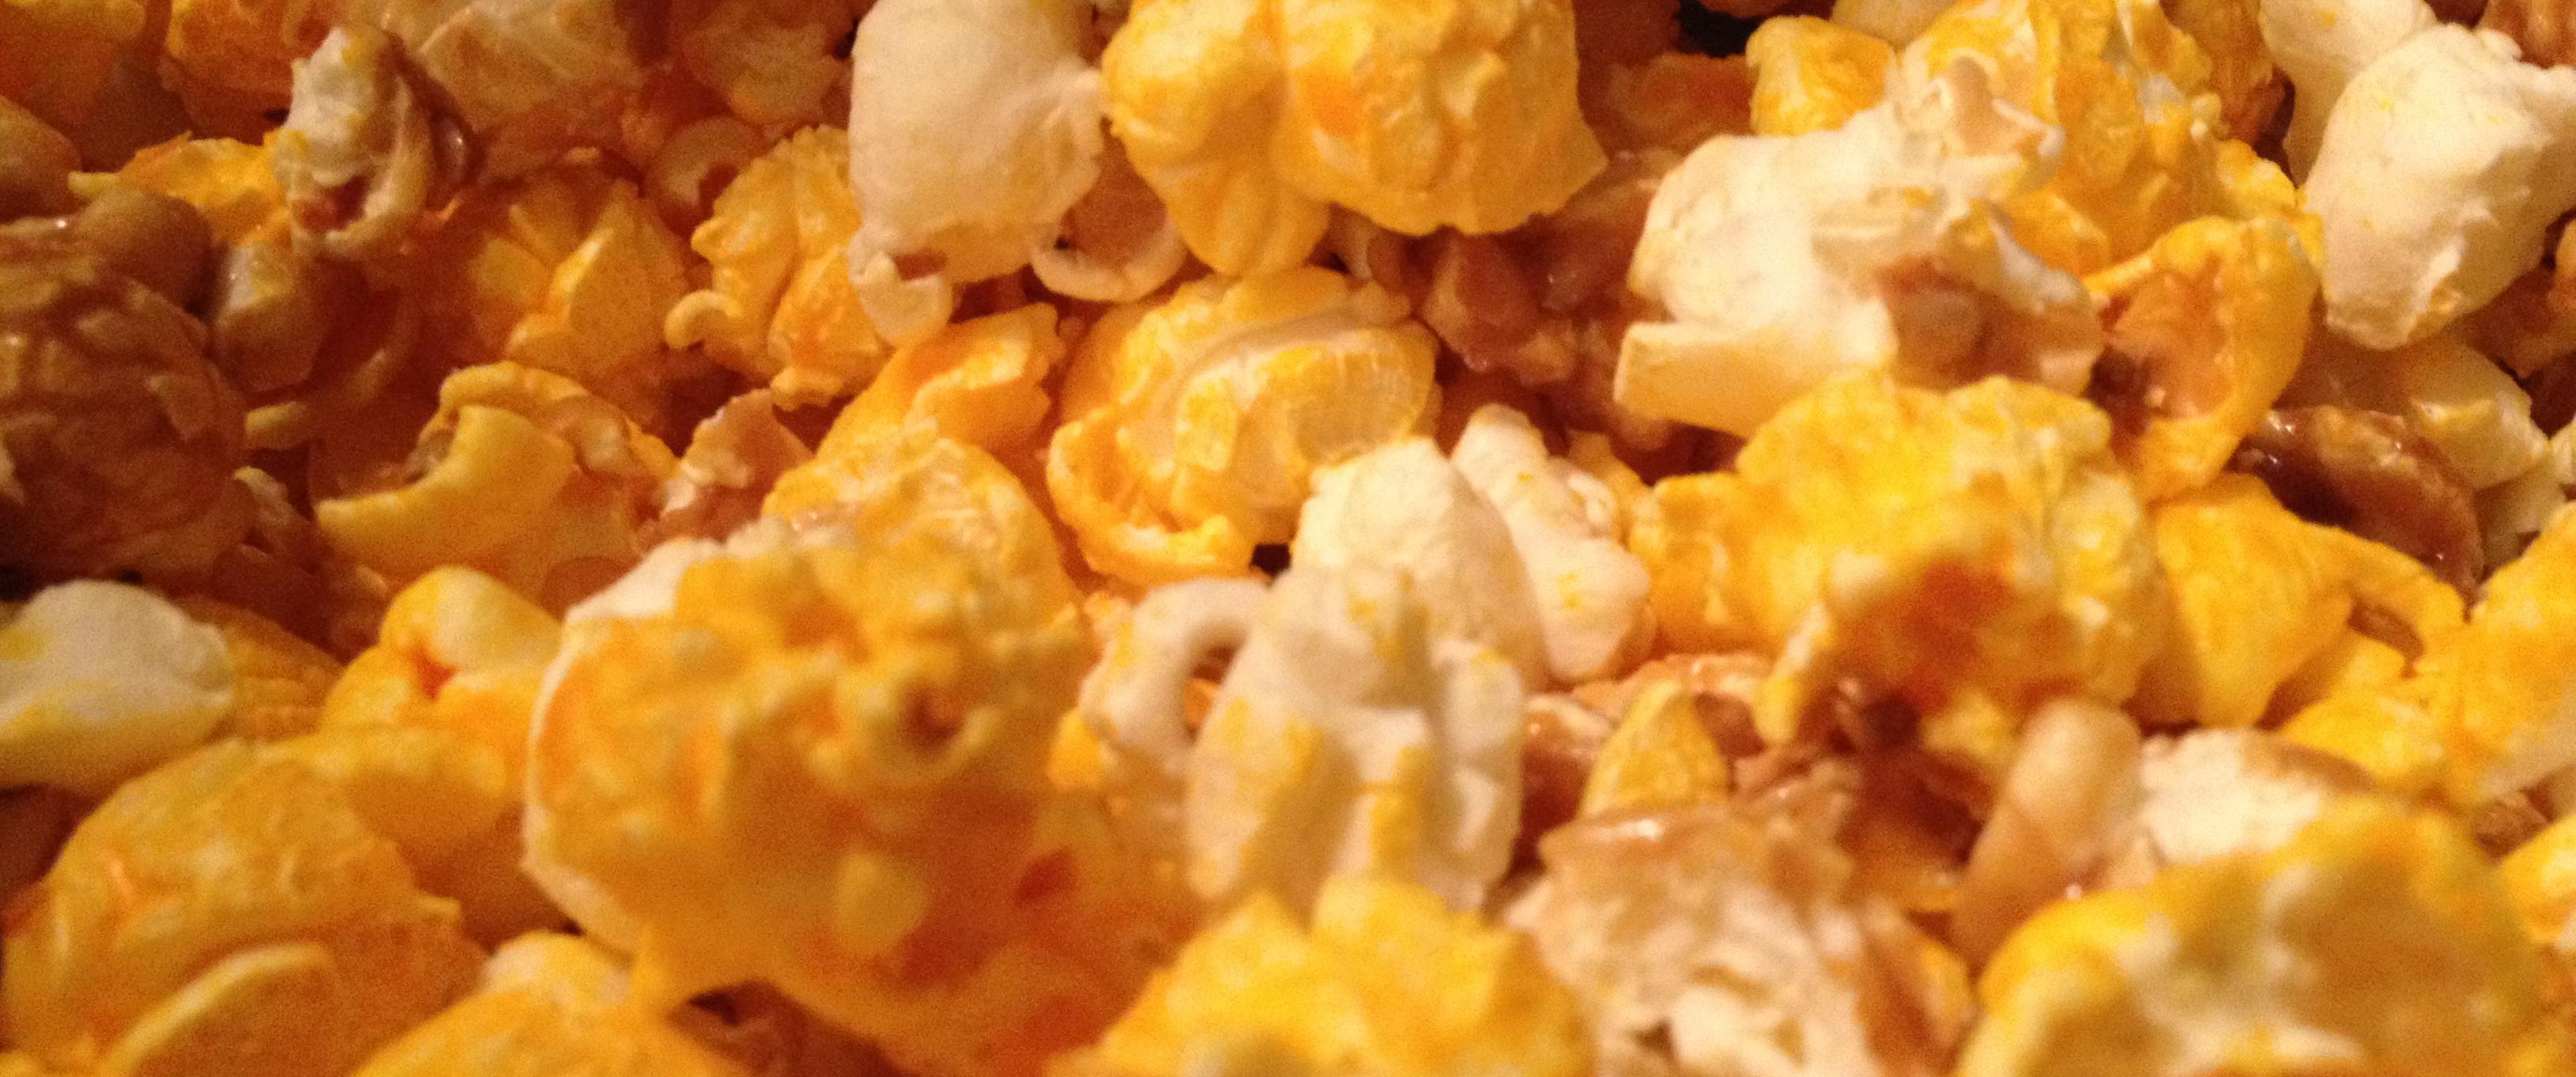 Chicago mix popcorn